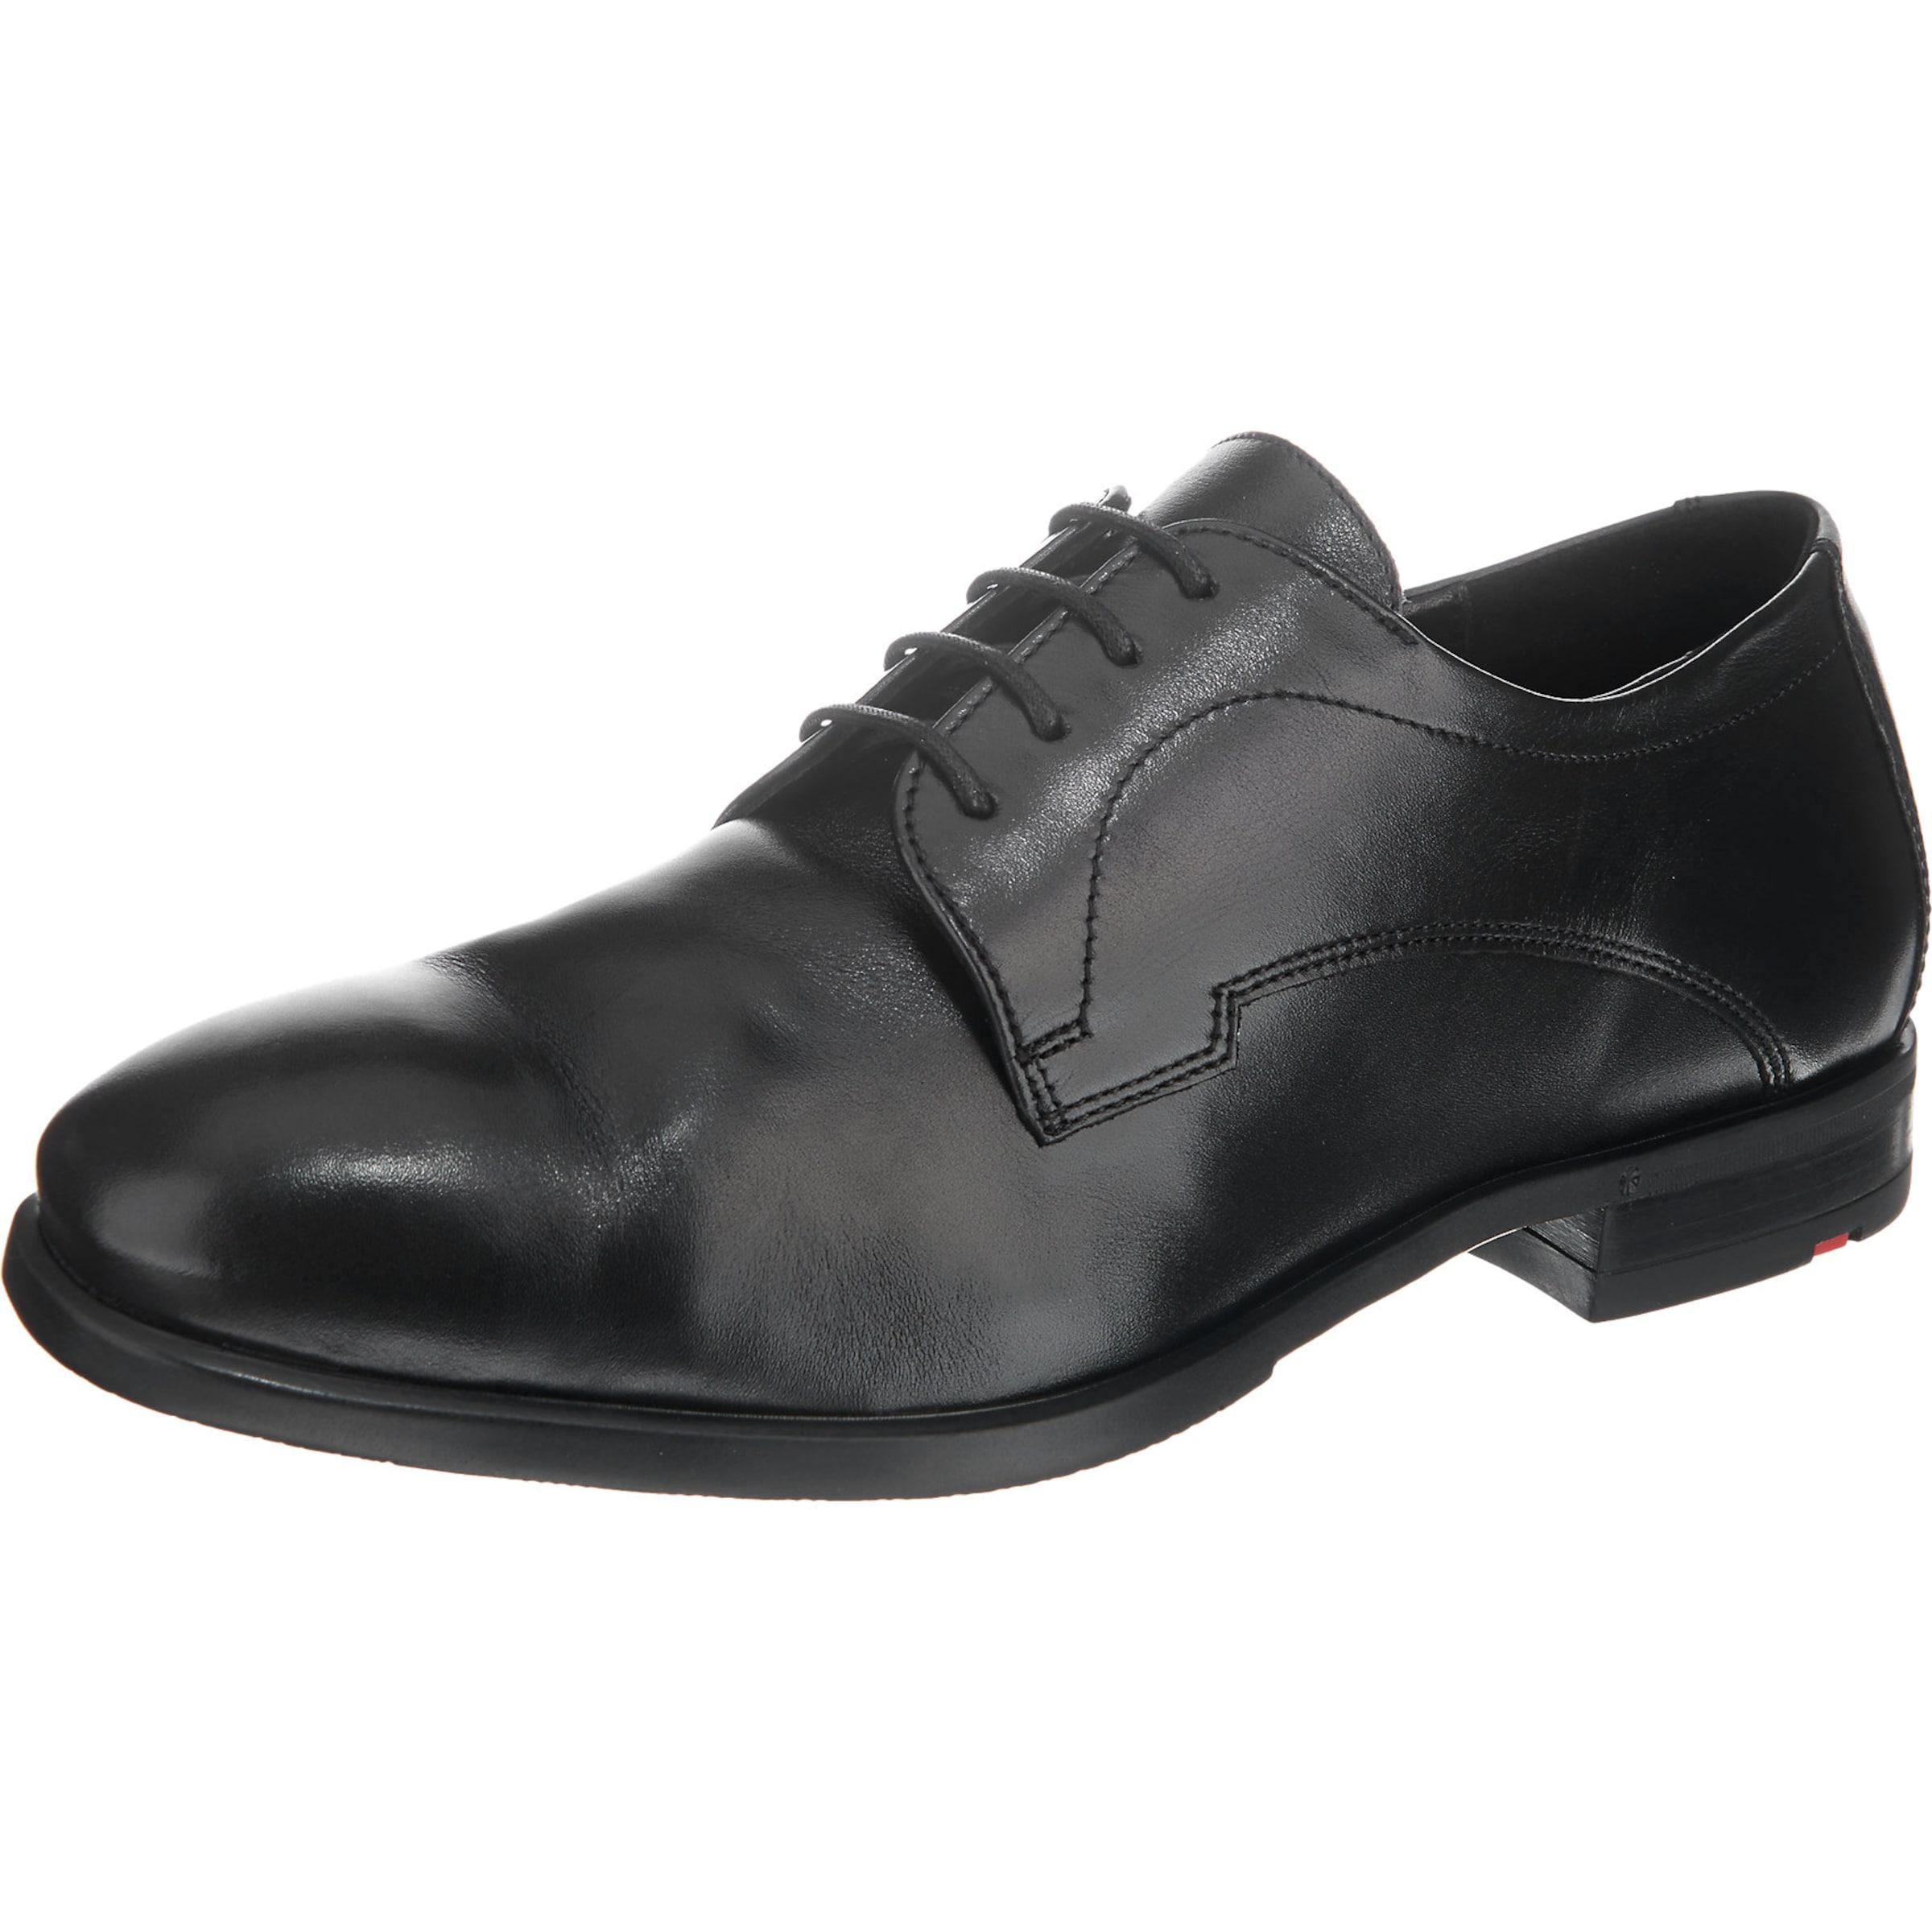 LLOYD Recit Business Schuhe Verschleißfeste billige Schuhe